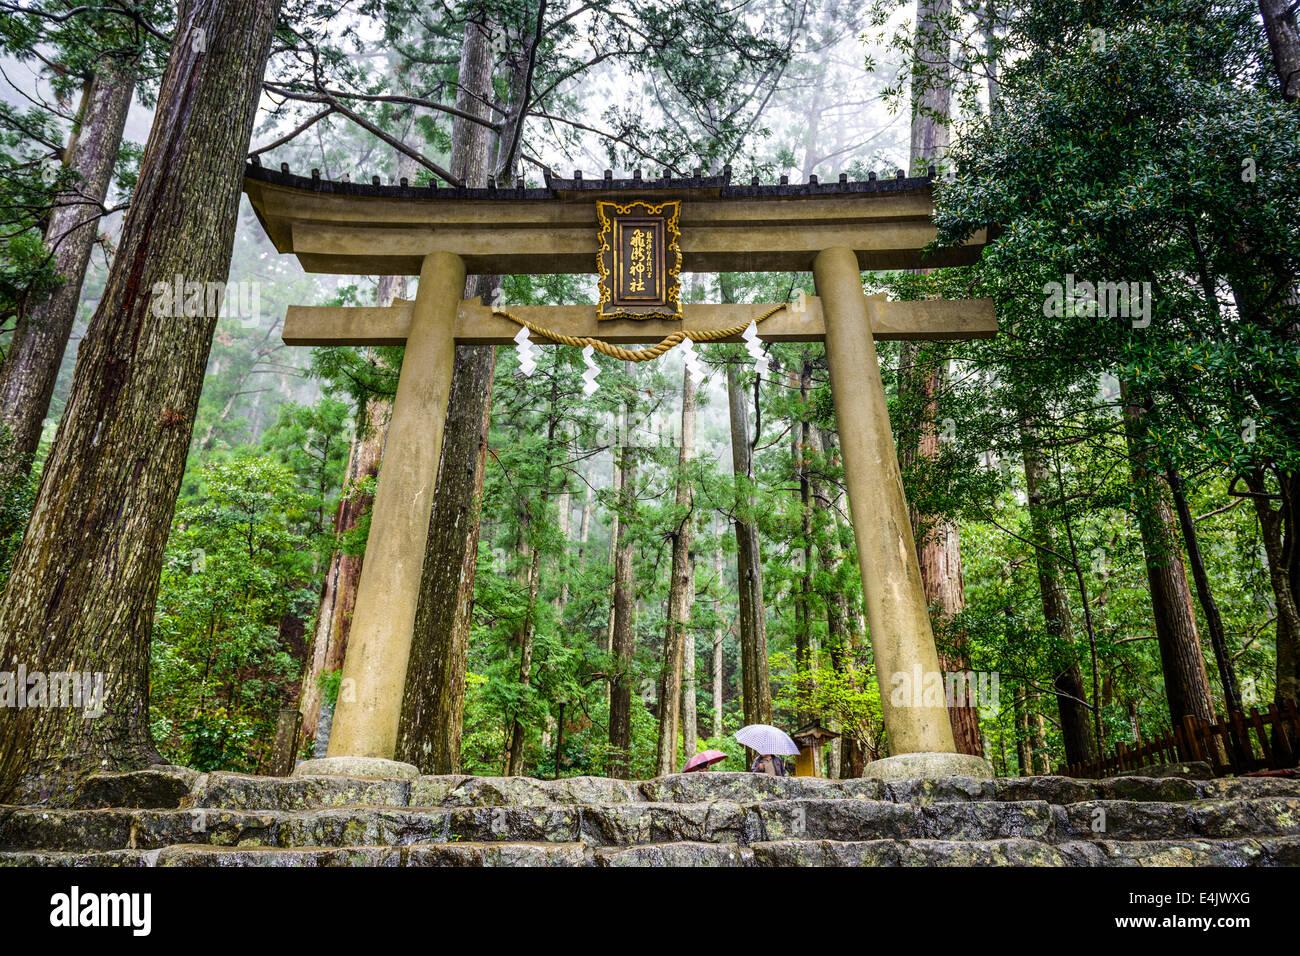 Kumano Kodo sacred trail in Wakayama, Japan. - Stock Image